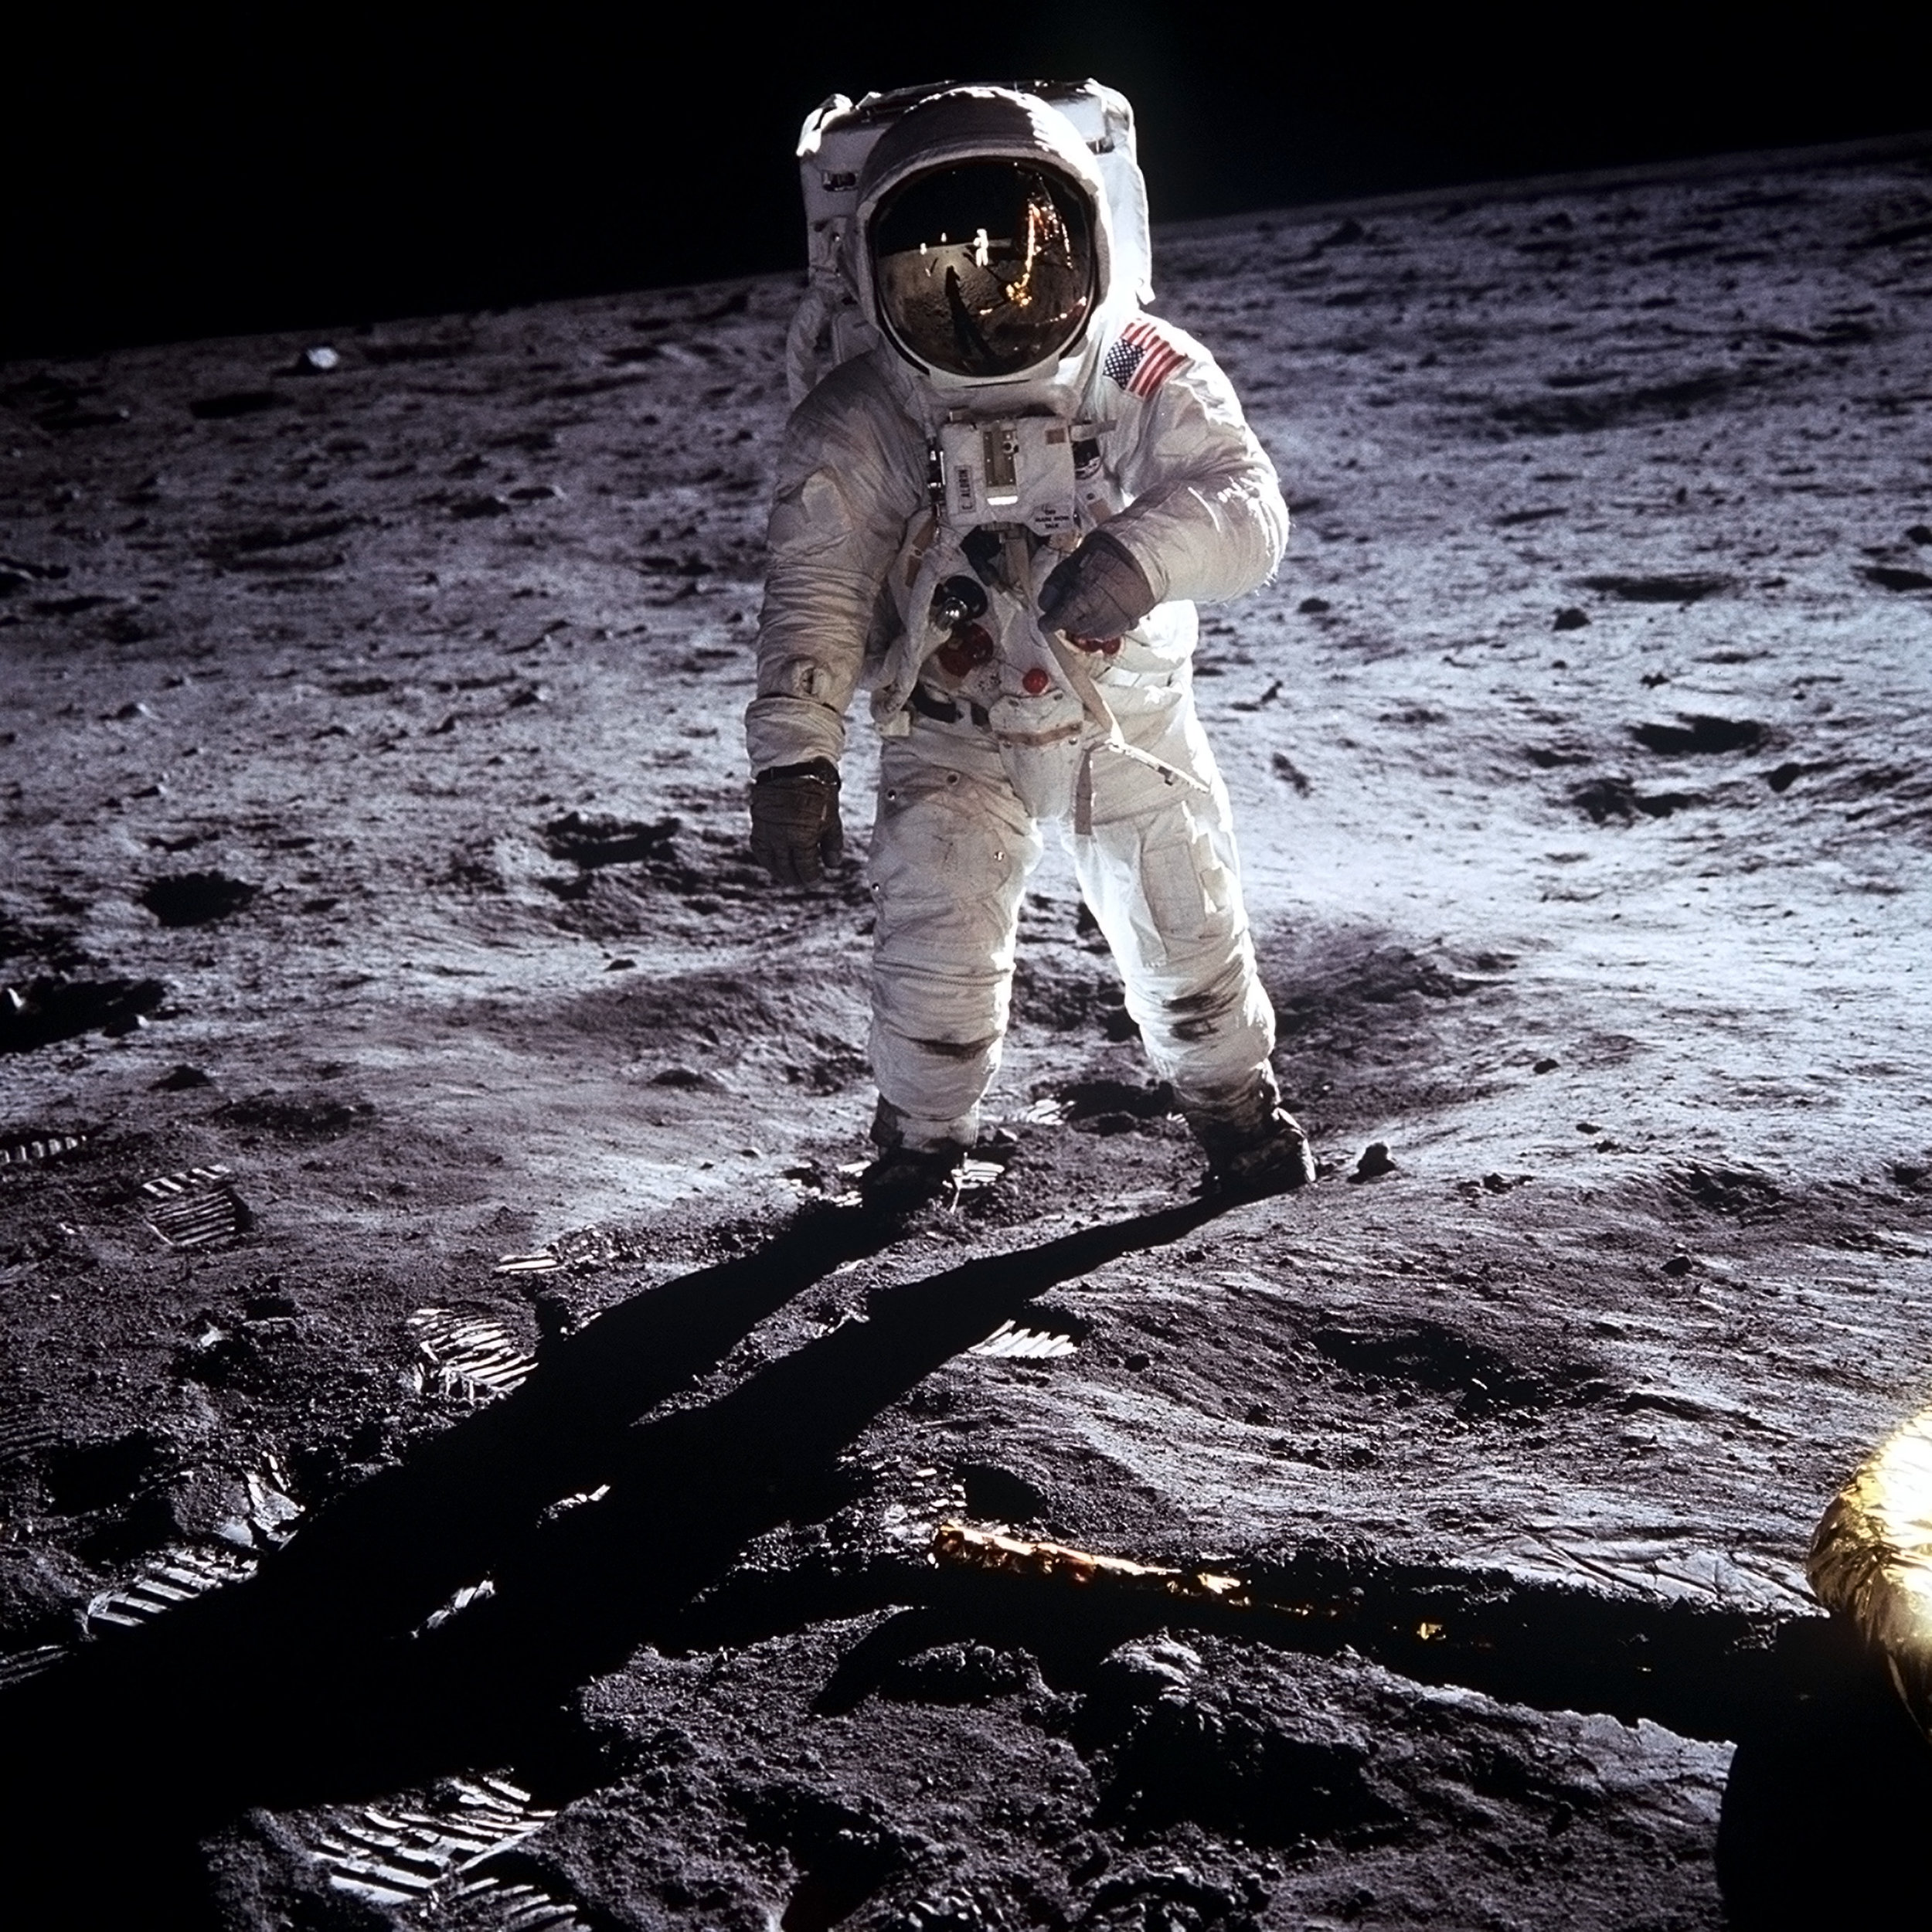 Apollo 11 astronaut Buzz Aldrin by Neil Armstrong, Sea of Tranquility, Moon, 1969